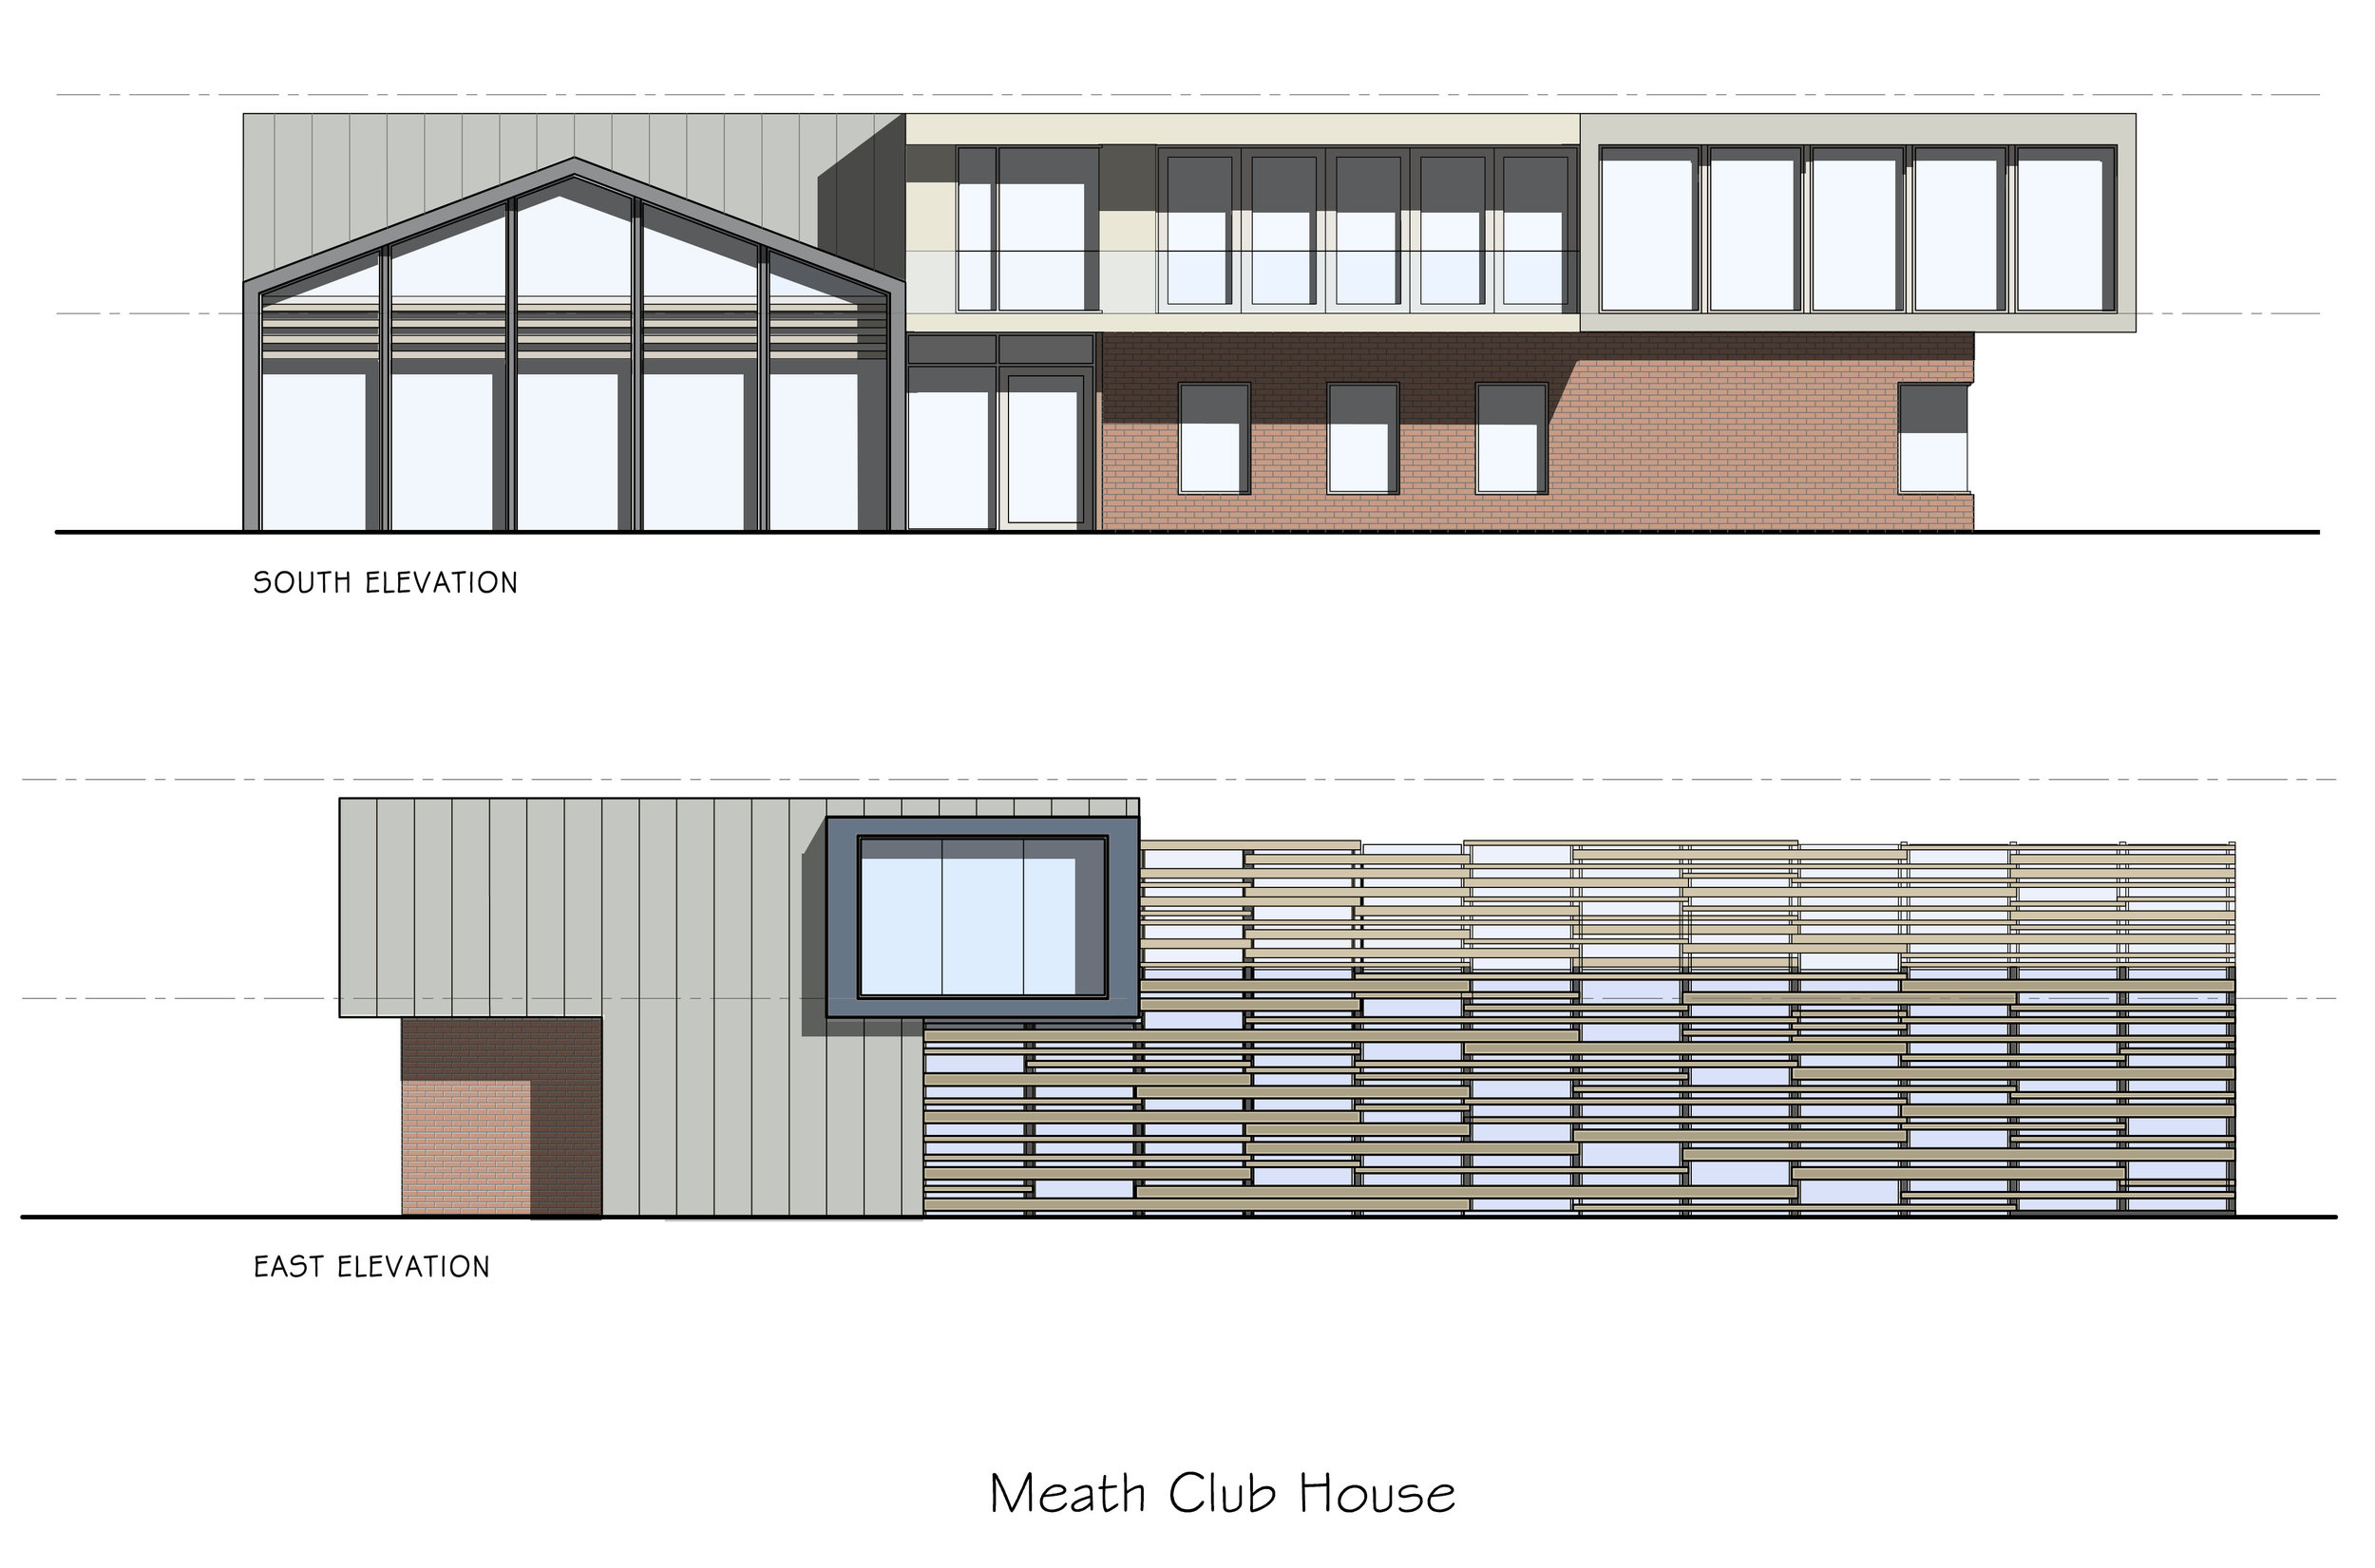 Meath Club House Elevations S E.jpg